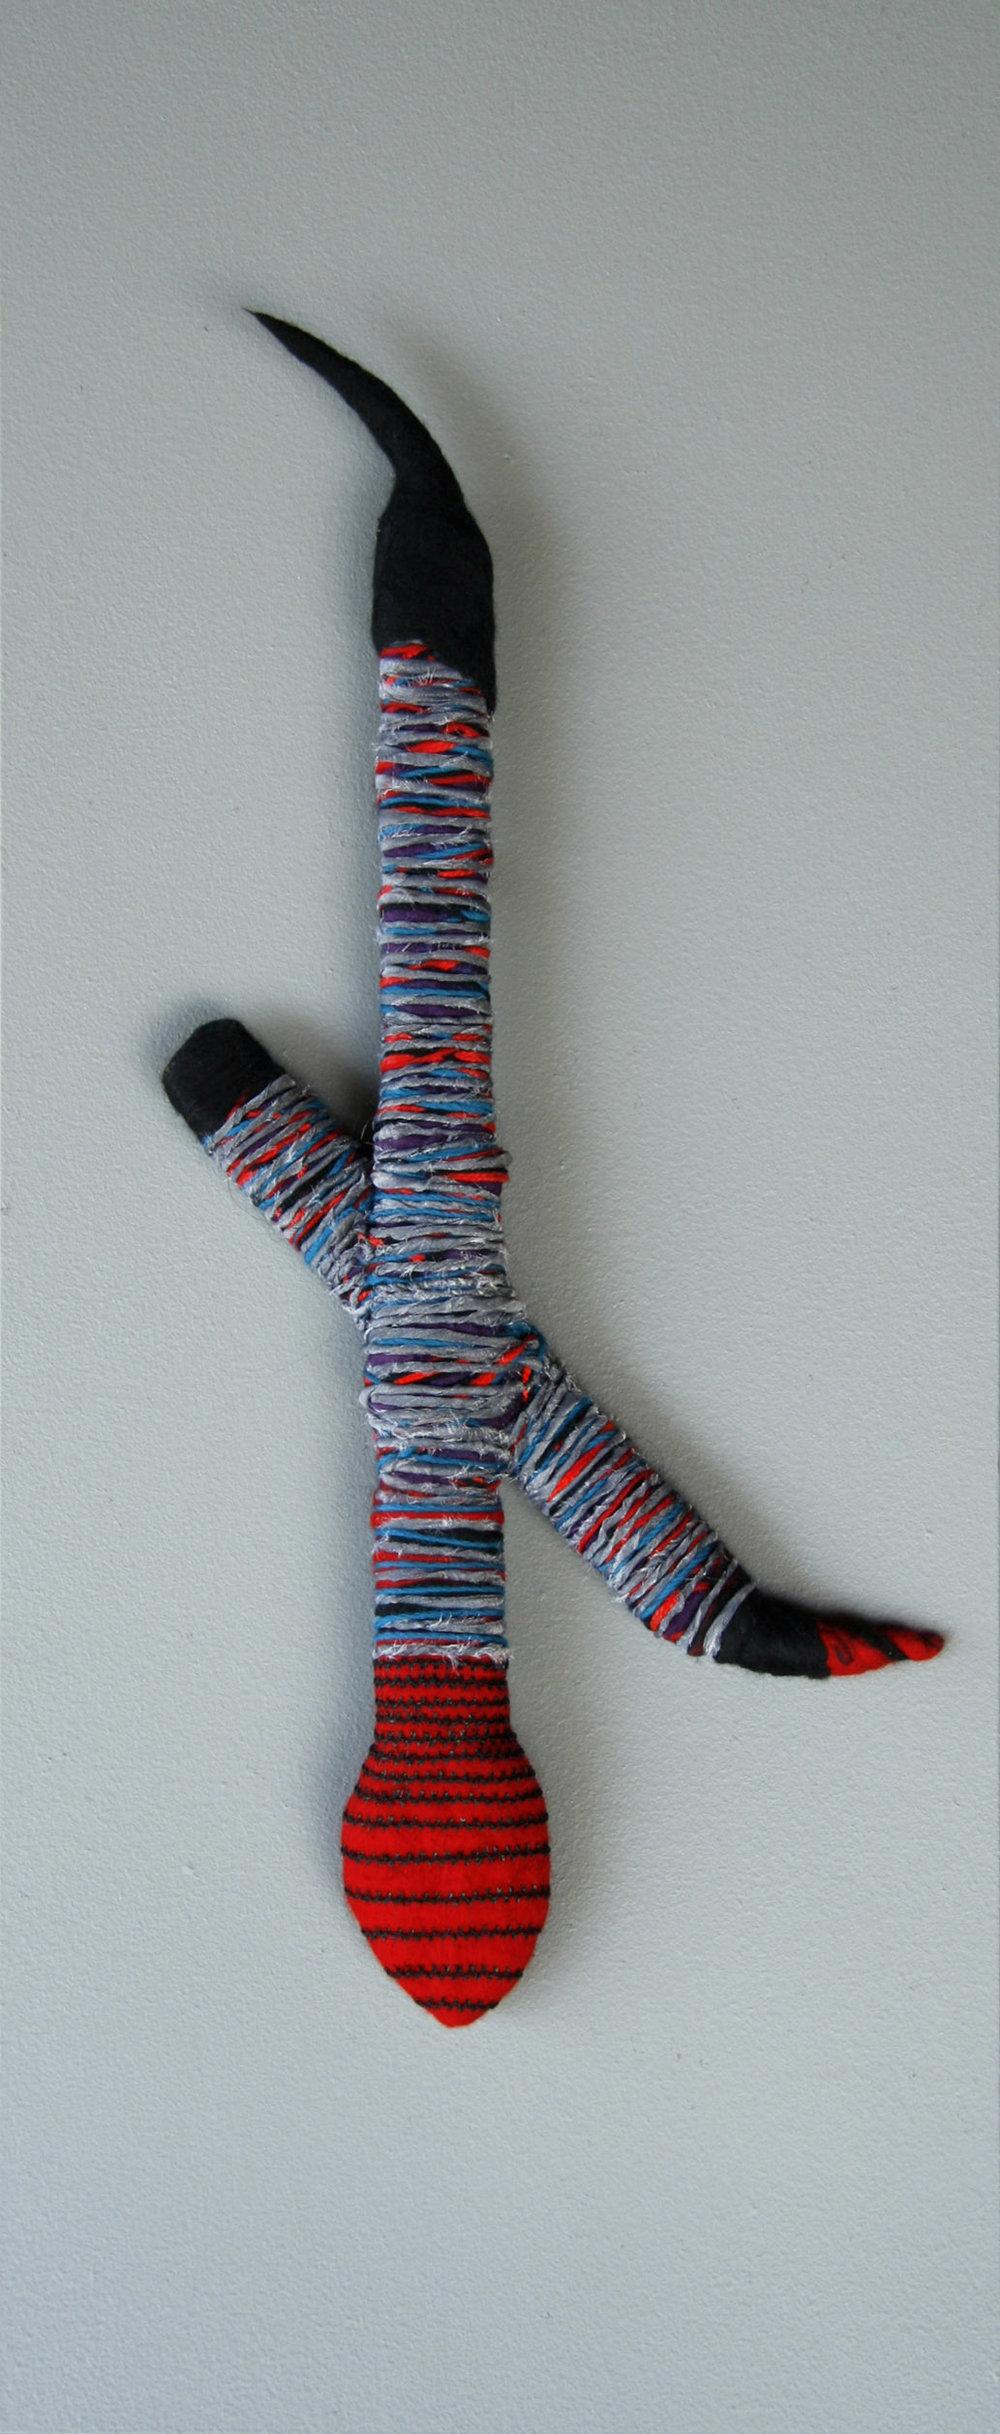 Za (2009). Fabric, felt, thread & wood